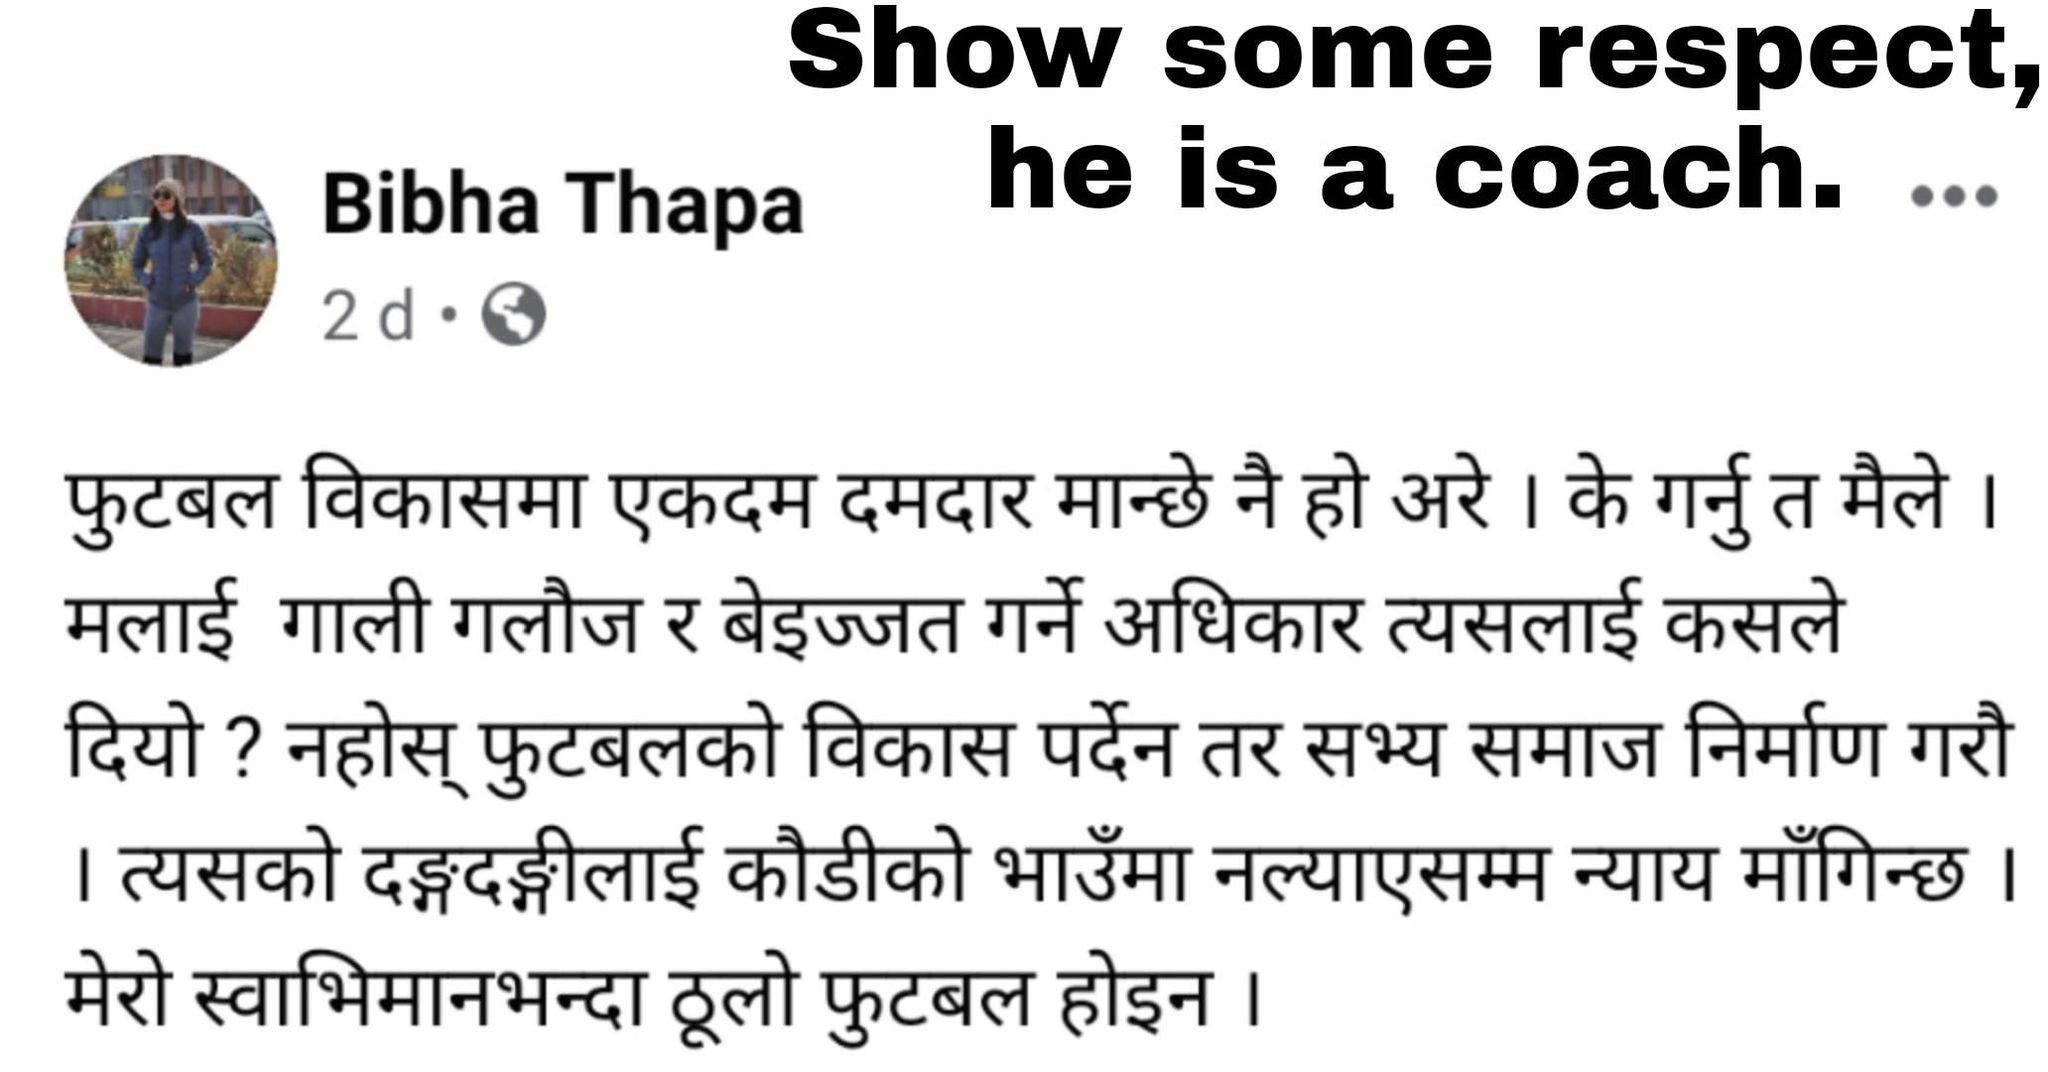 Bibha Thapa